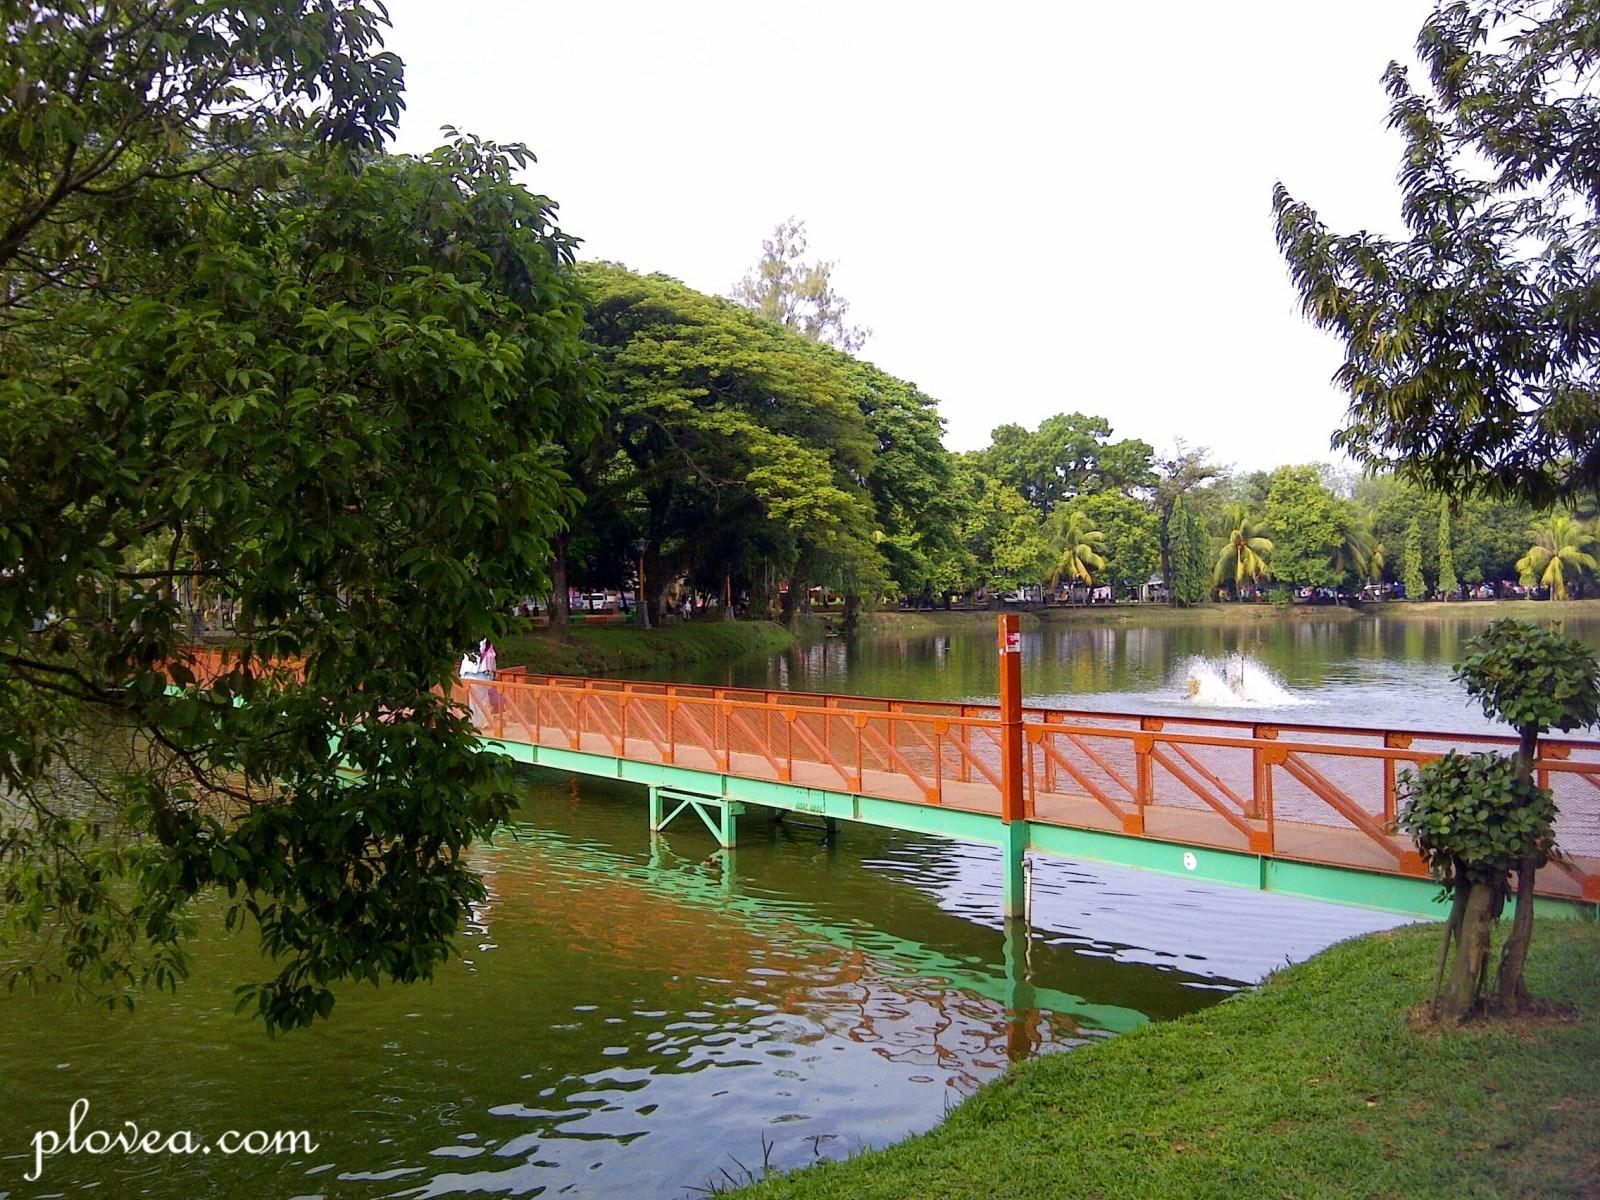 Ki Park Palembang Samosir Meets Krones Jembatan Merah Tengah Kambang